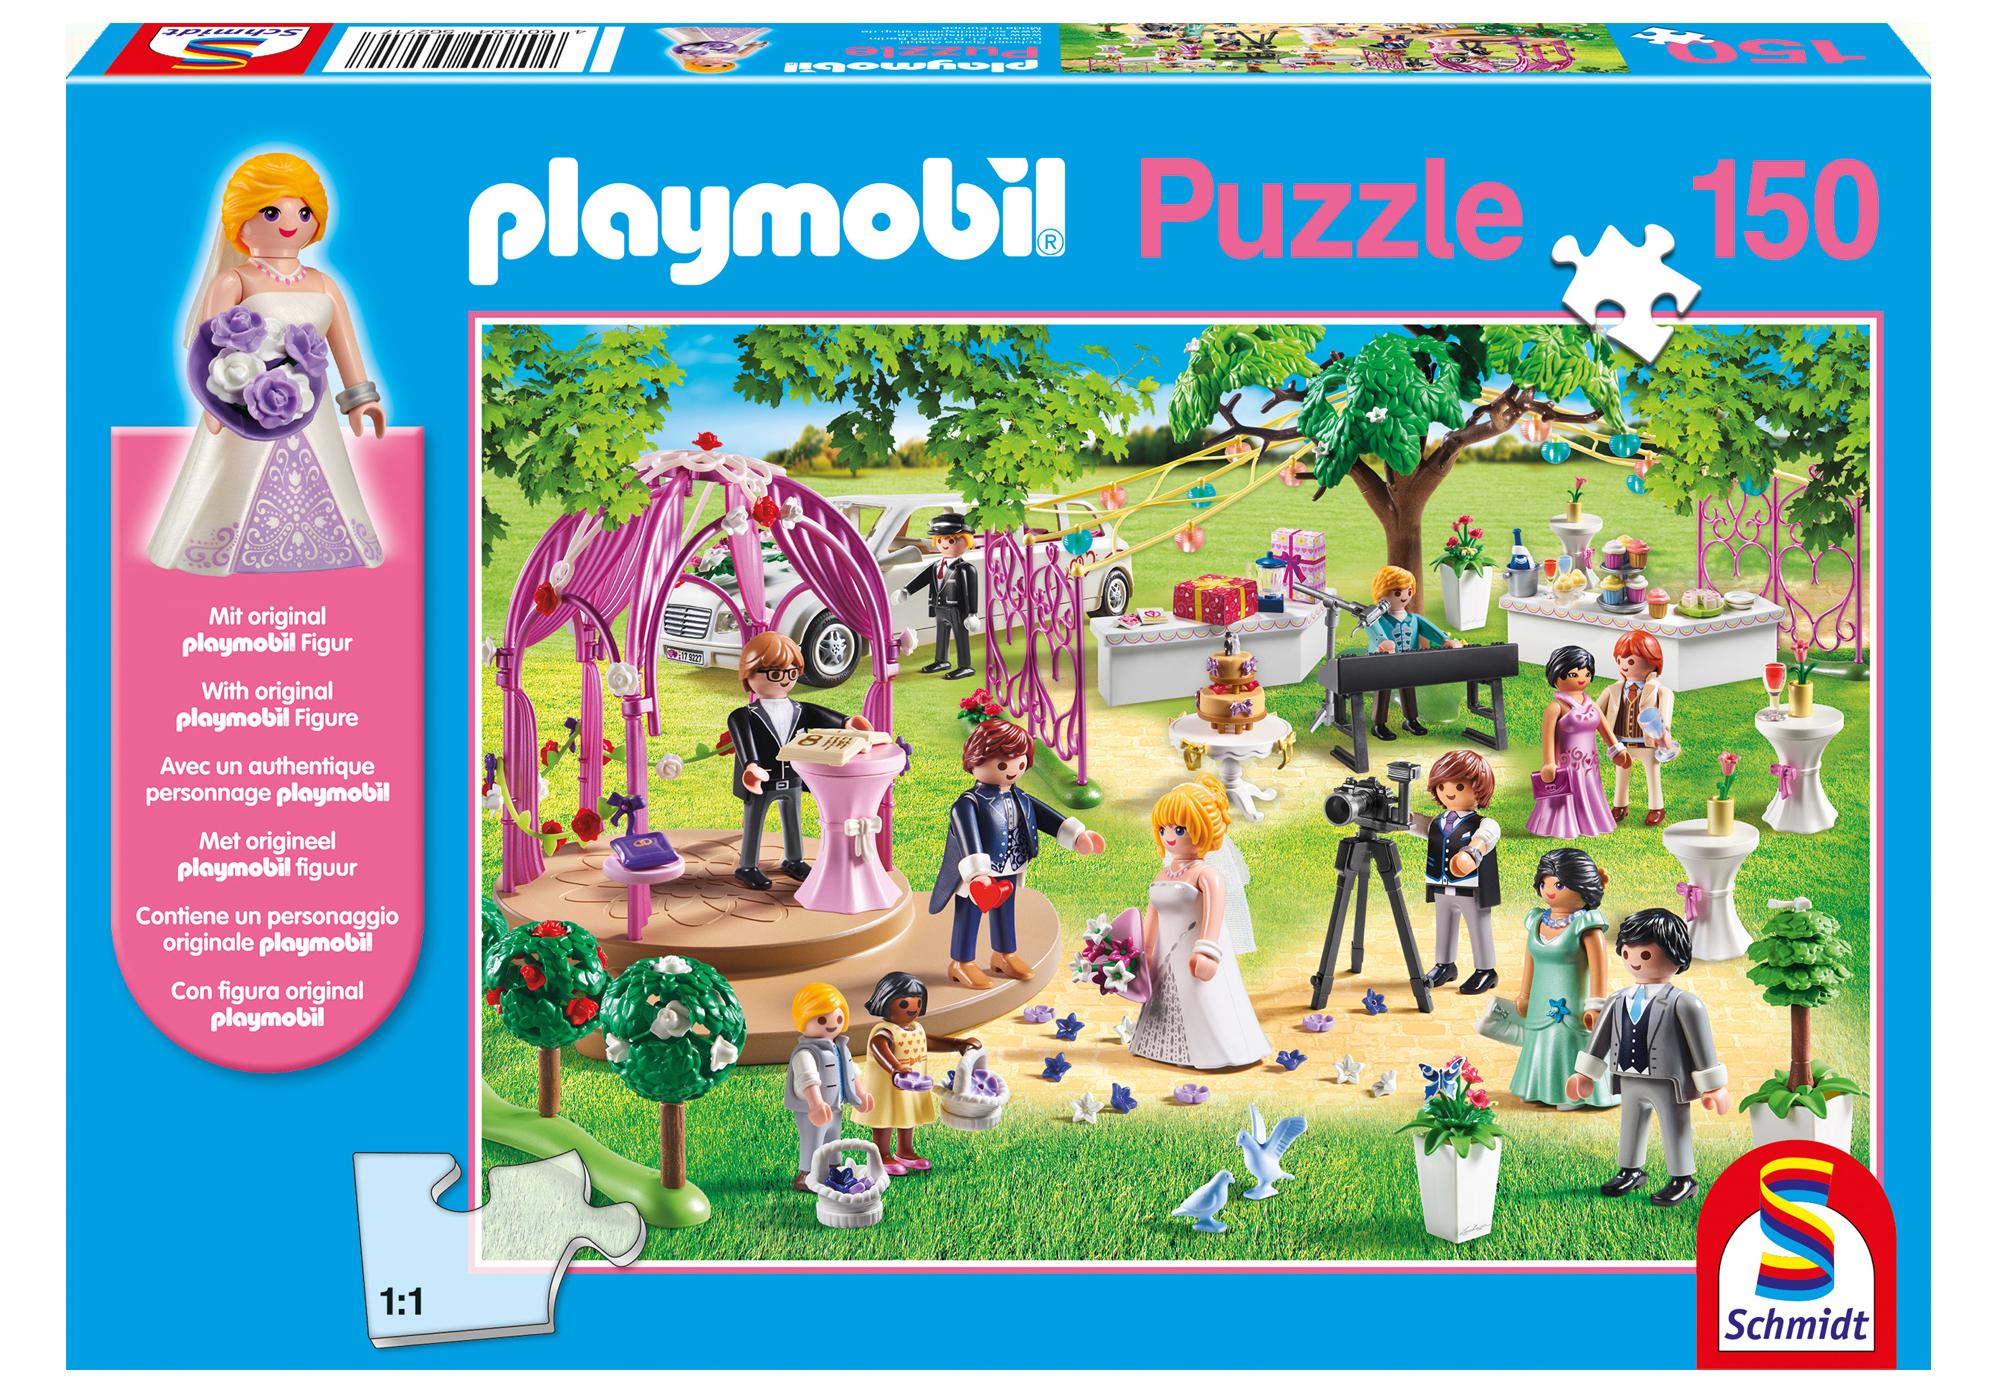 http://media.playmobil.com/i/playmobil/80087_product_detail/Puzzle Hochzeit